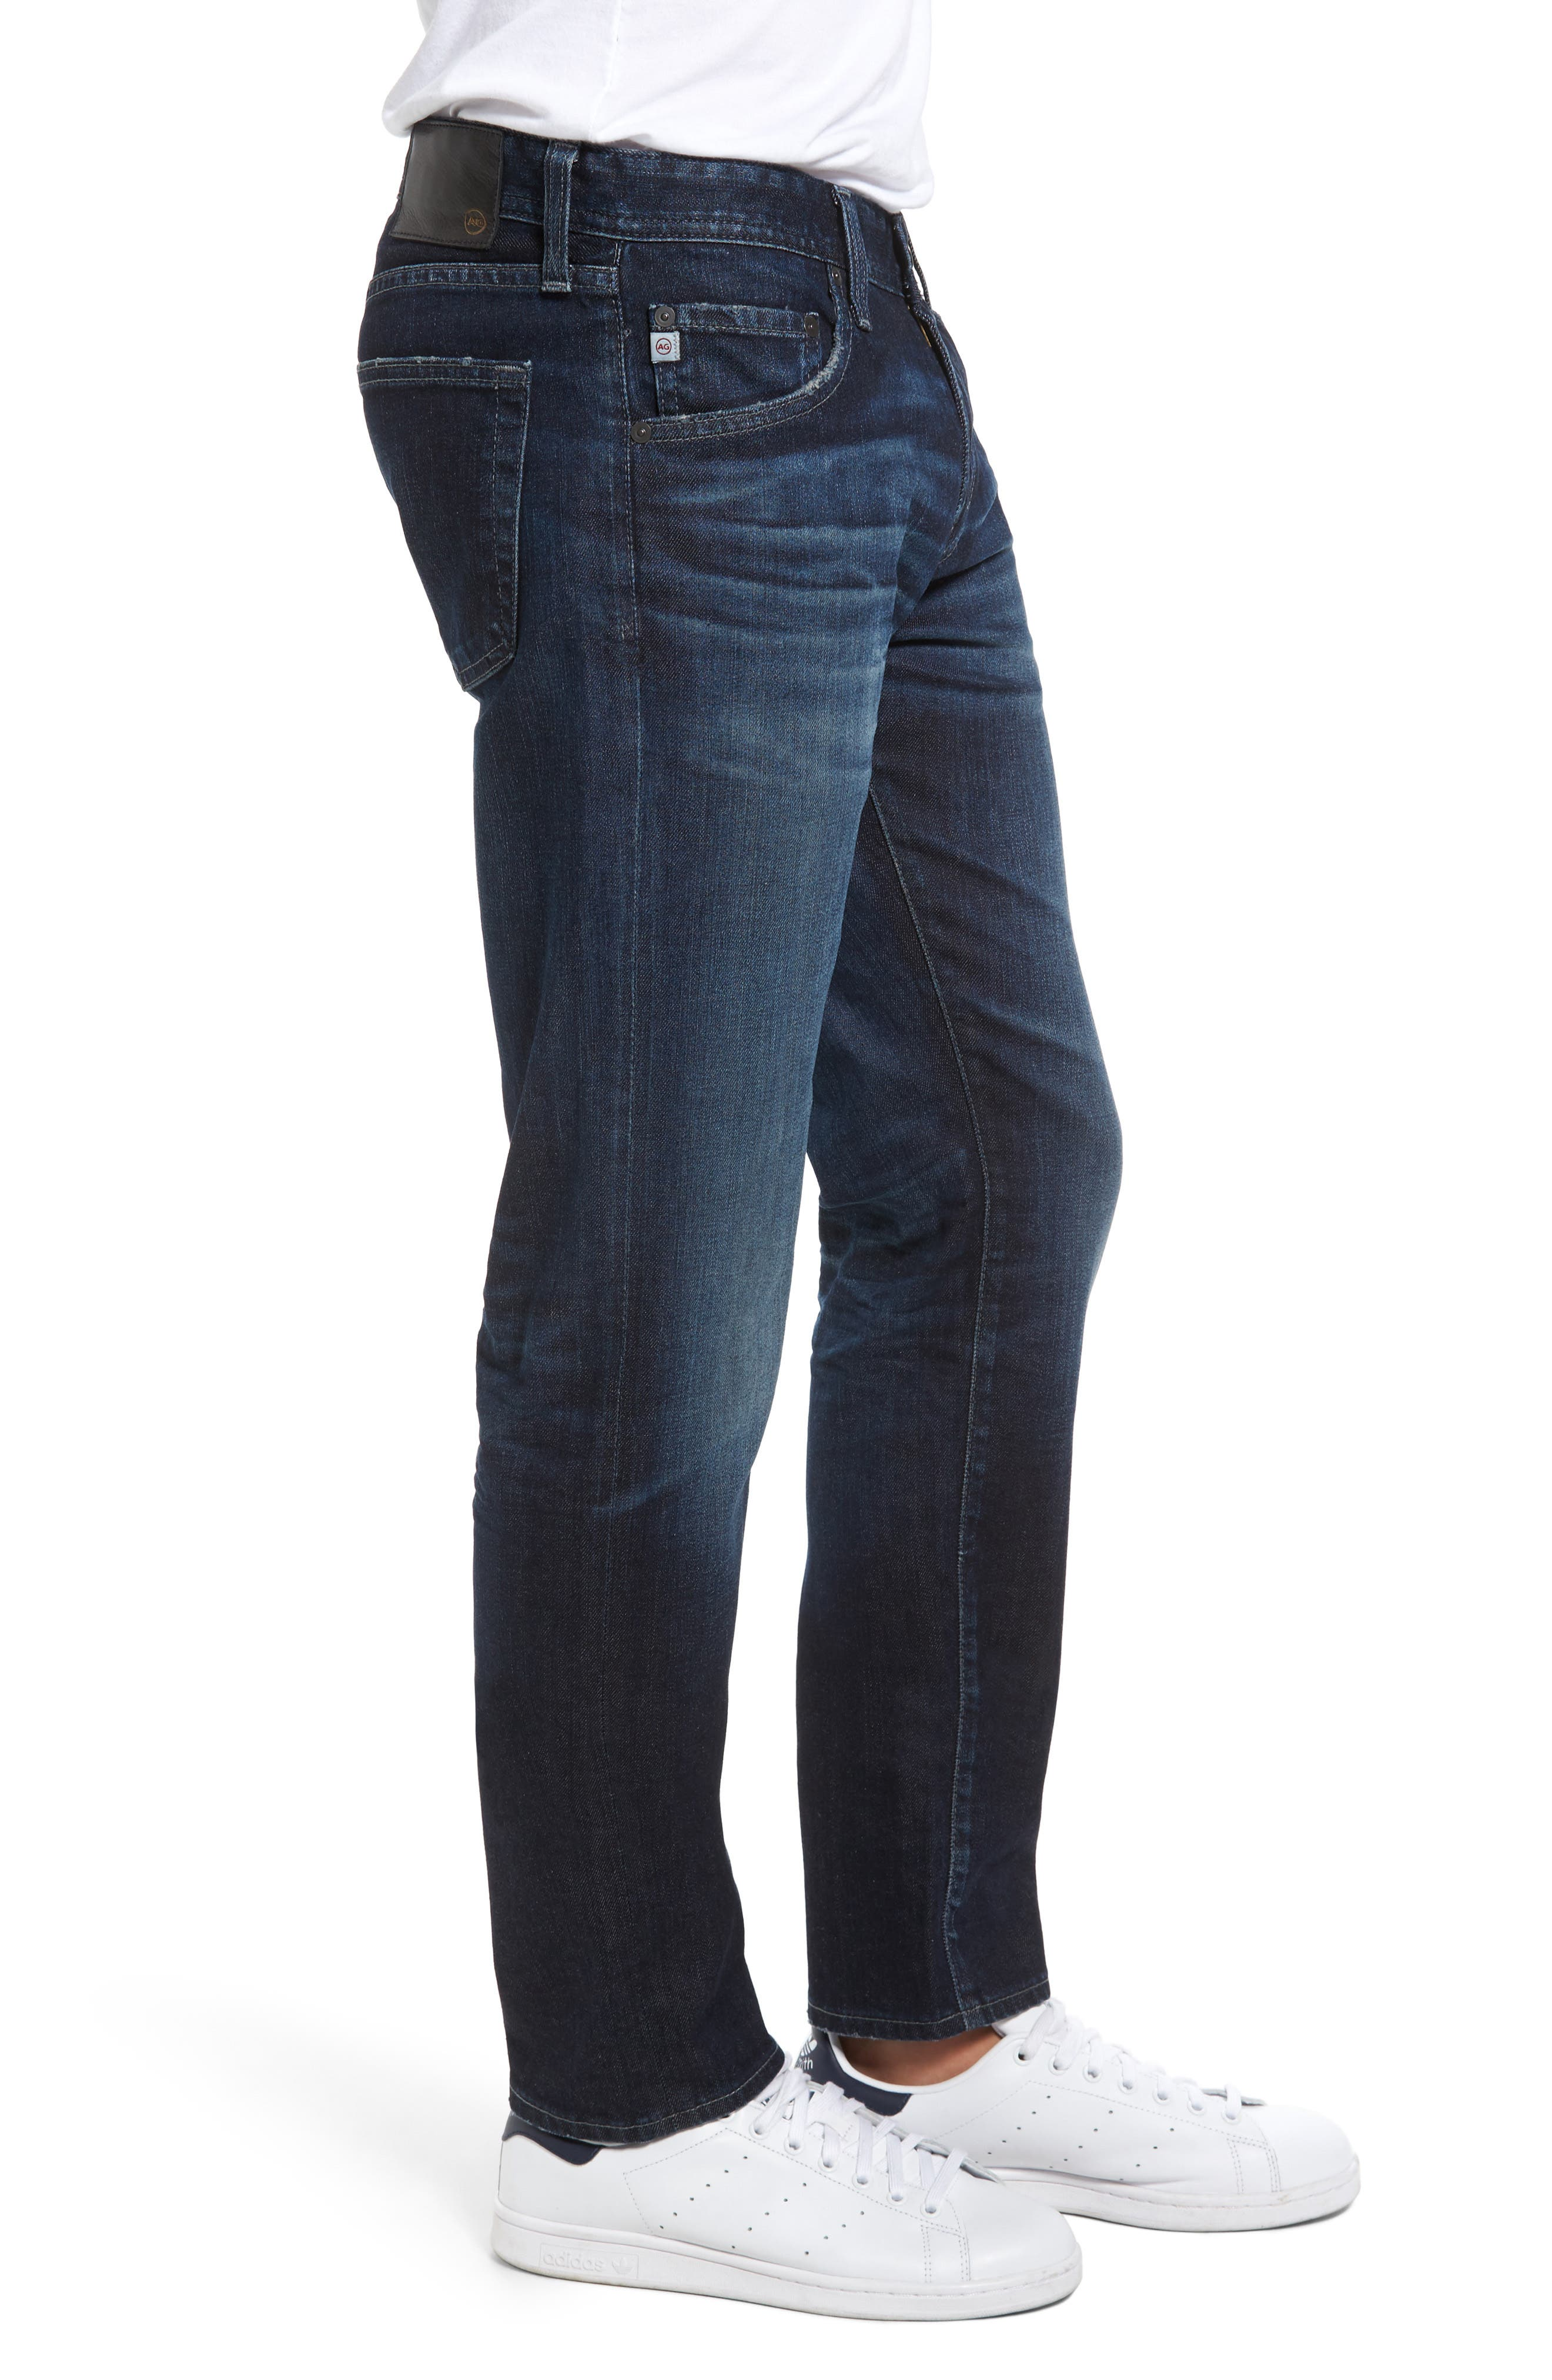 Tellis Slim Fit Jeans,                             Alternate thumbnail 3, color,